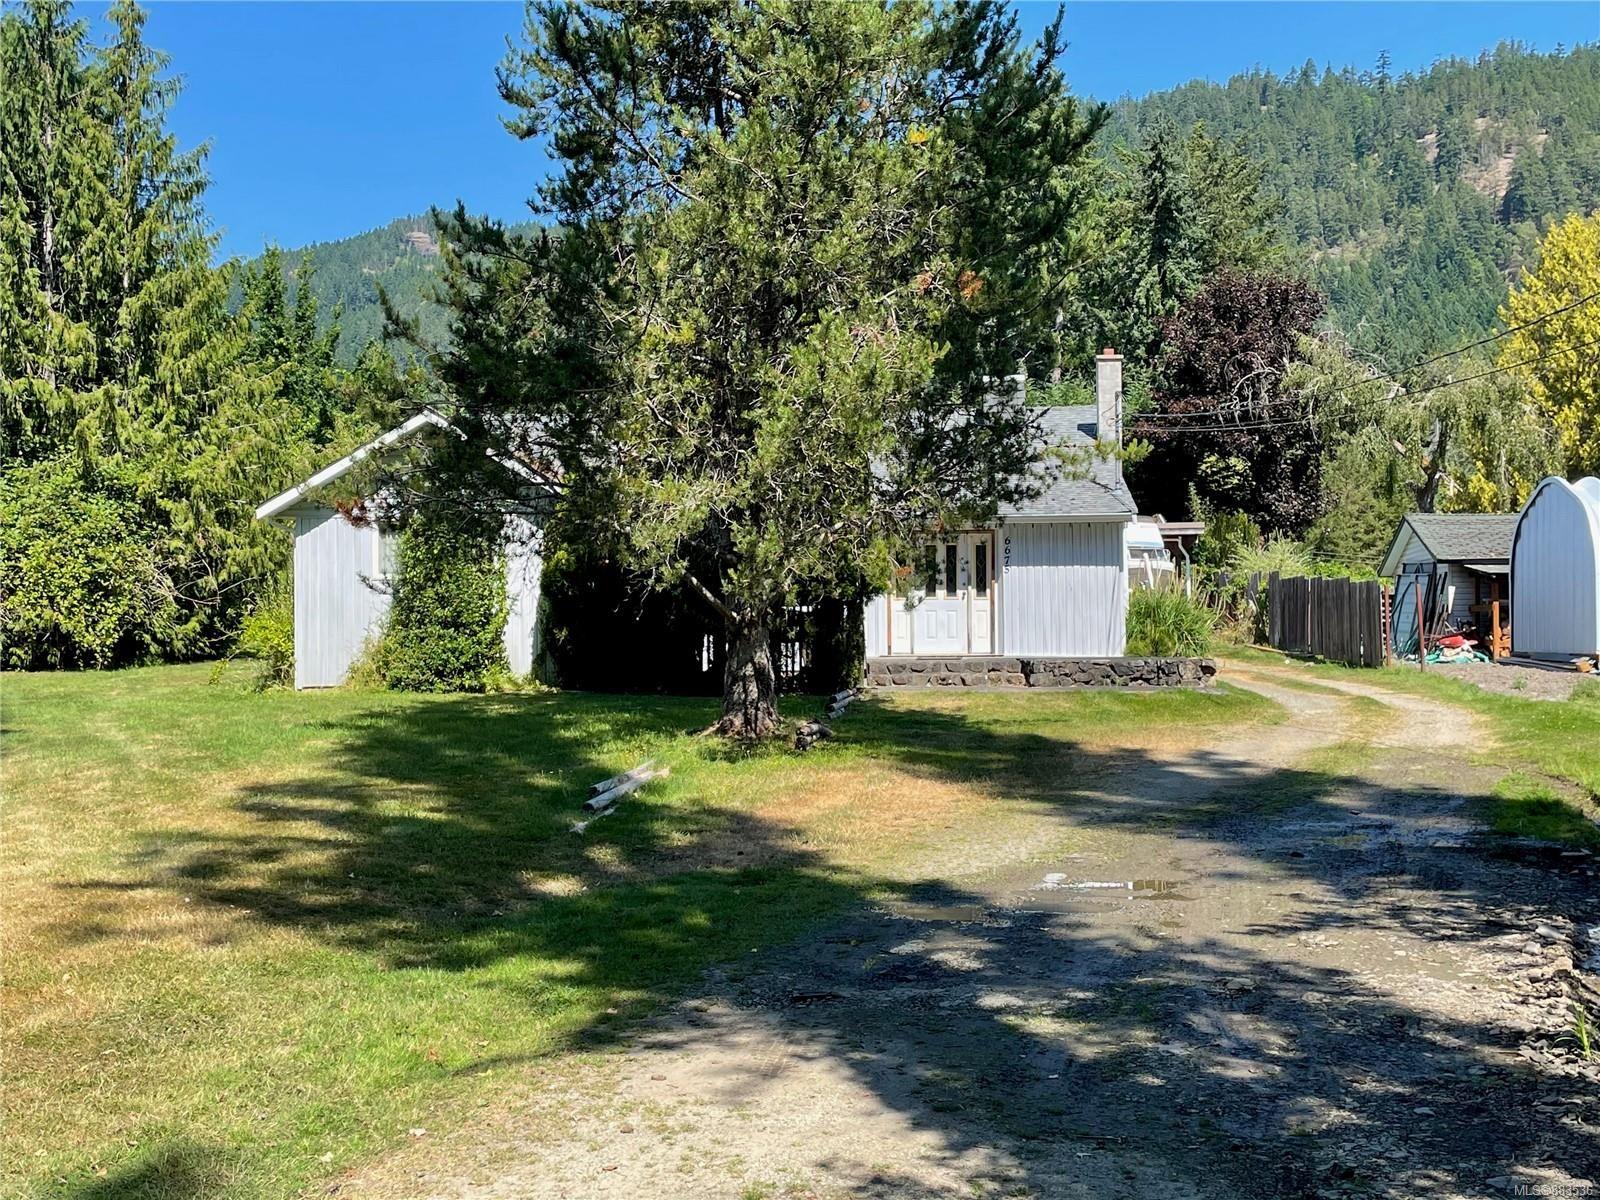 Main Photo: 6675 Cherry Creek Rd in : PA Alberni Valley House for sale (Port Alberni)  : MLS®# 883536